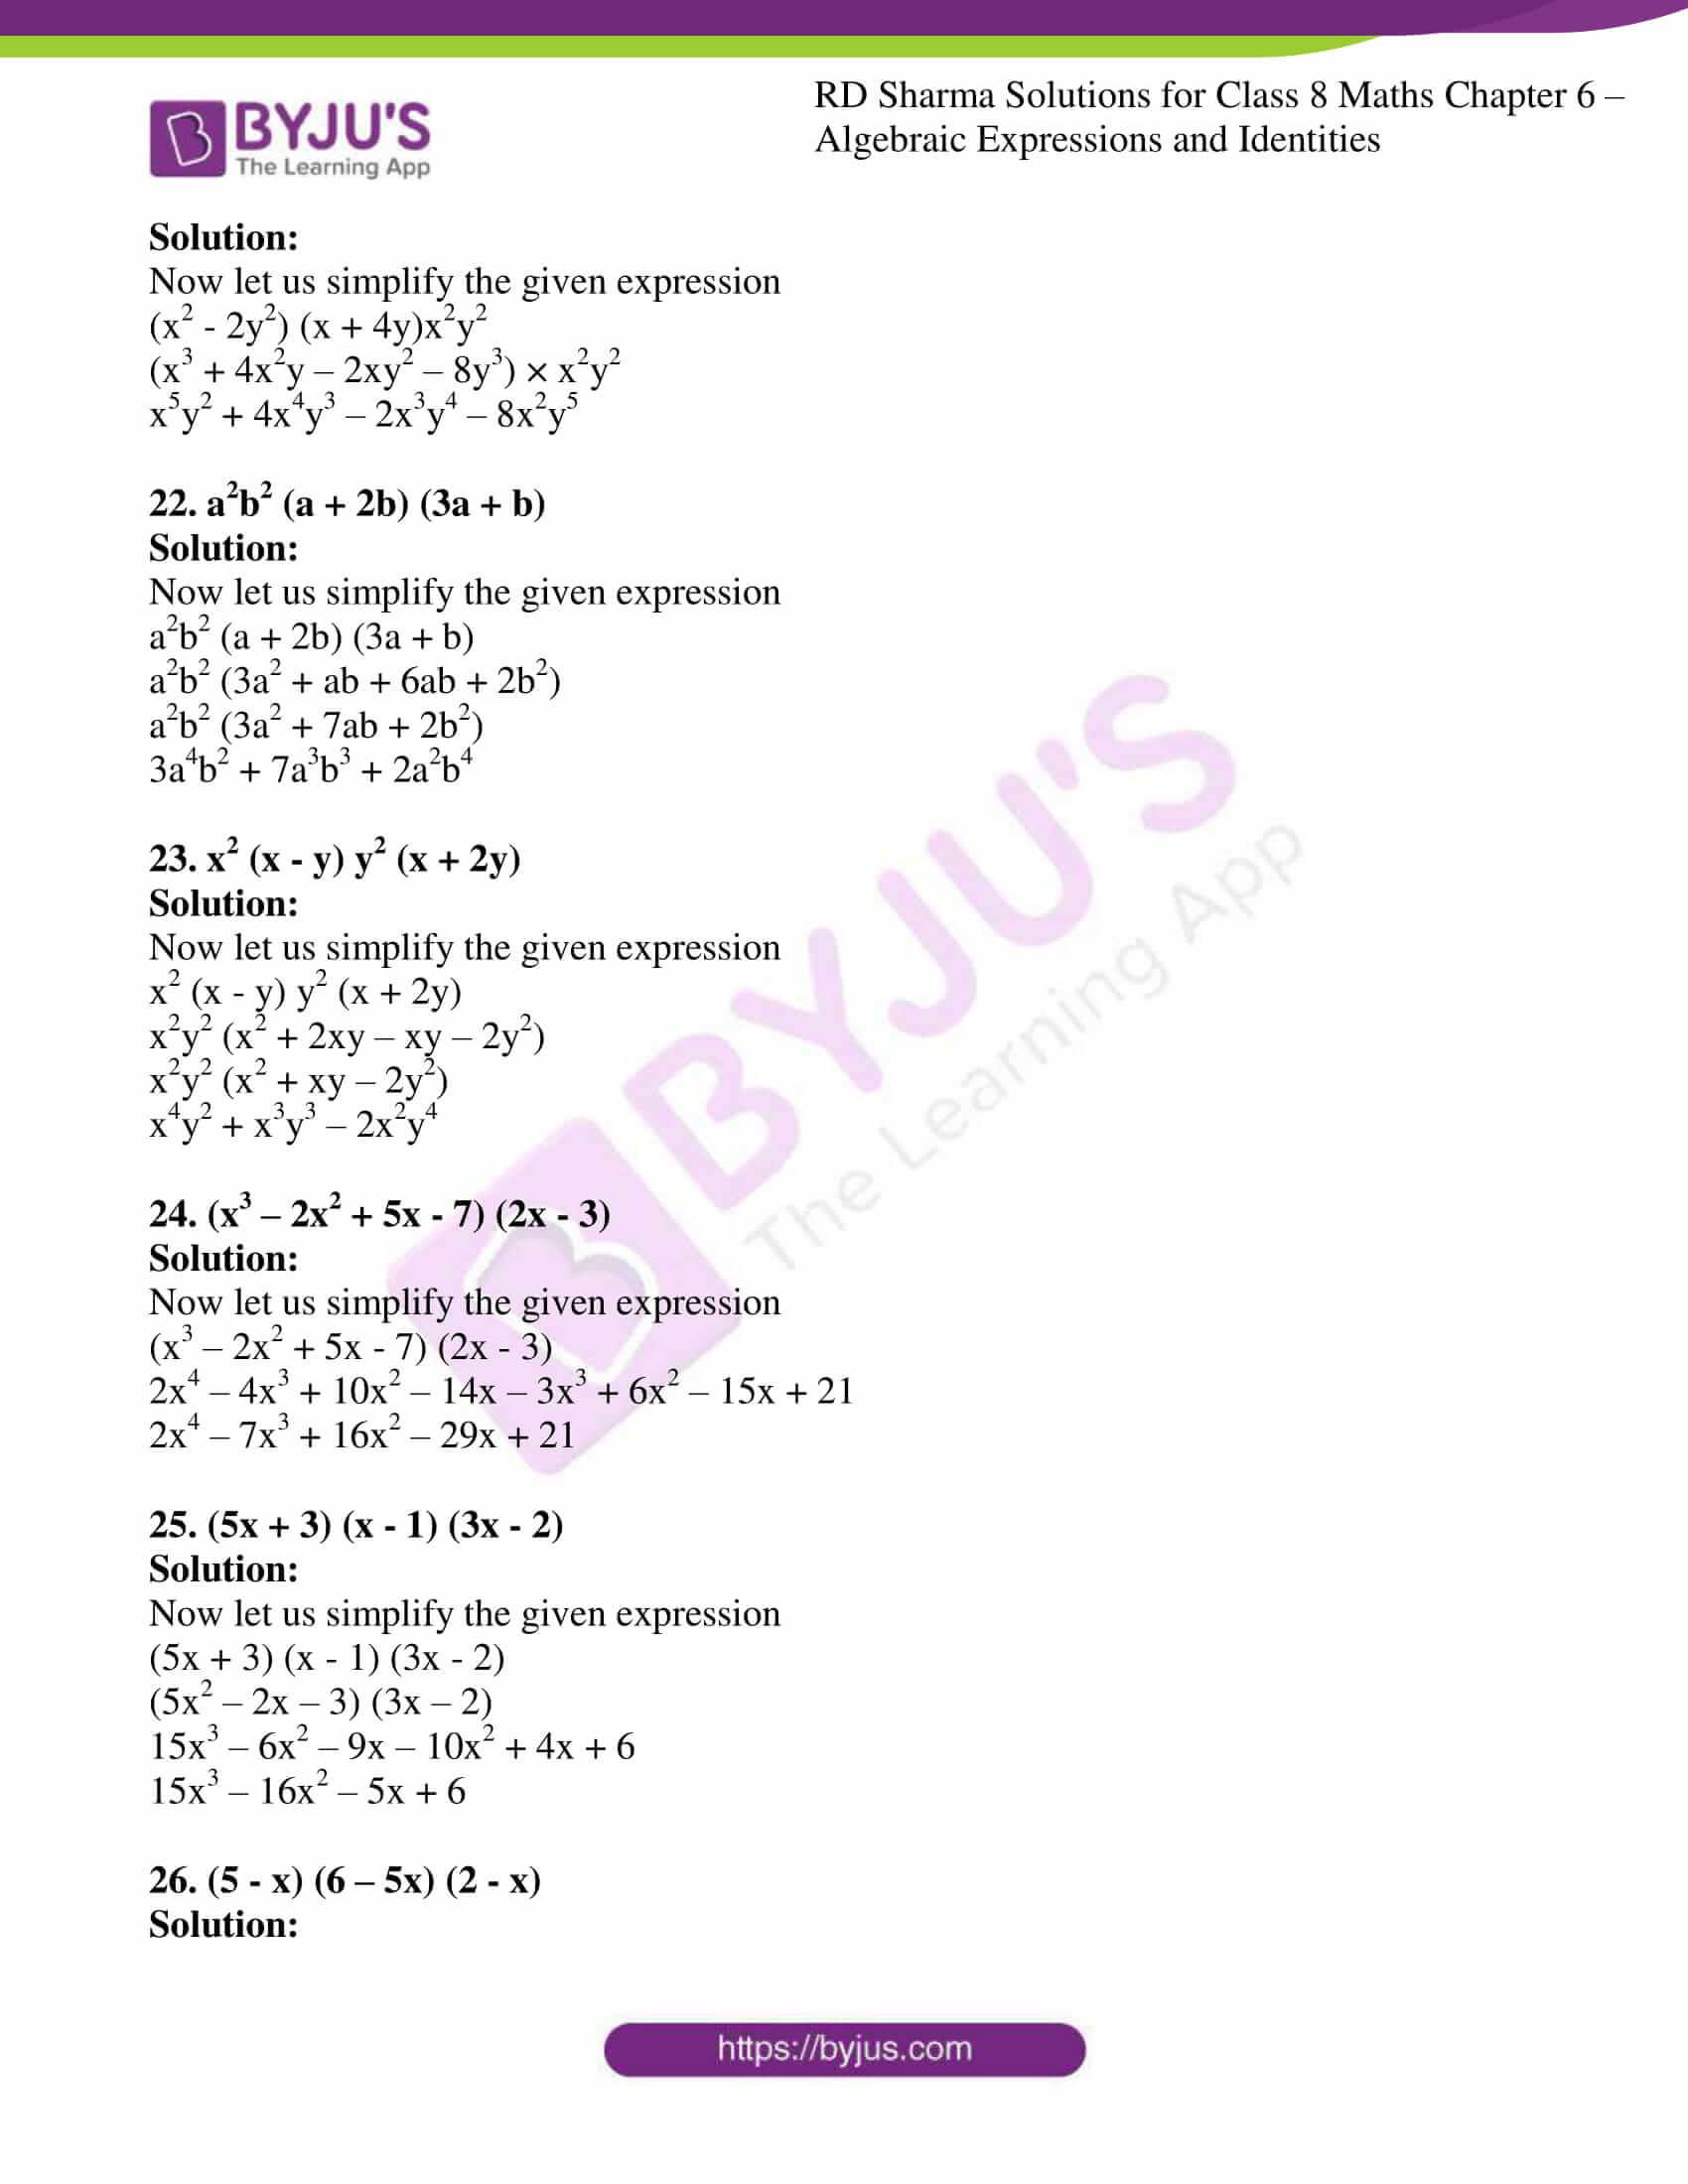 rd sharma class 8 maths chapter 6 exercise 5 6